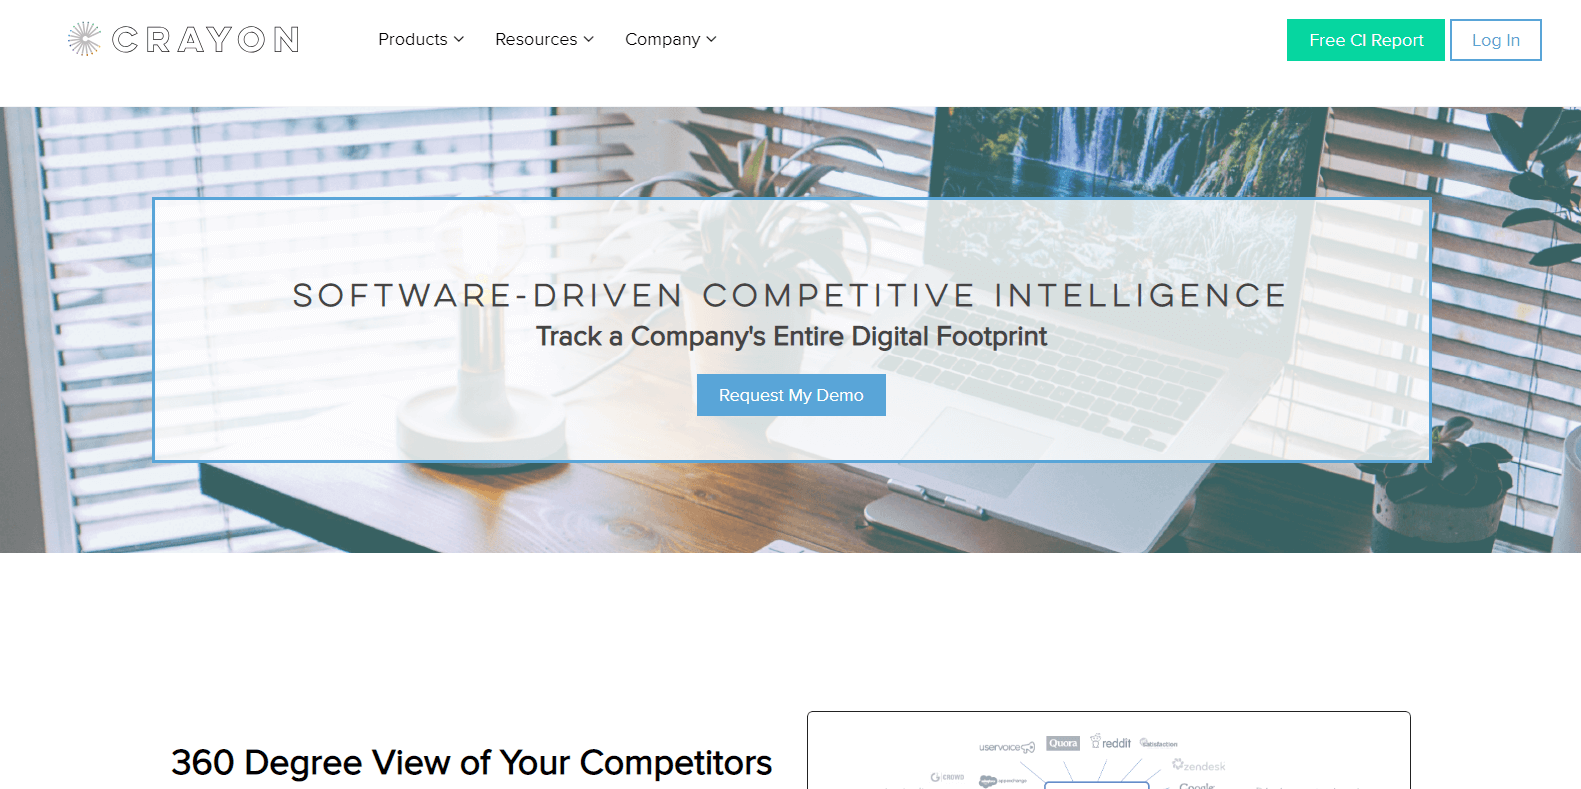 Crayon Competitor Analysis Tools